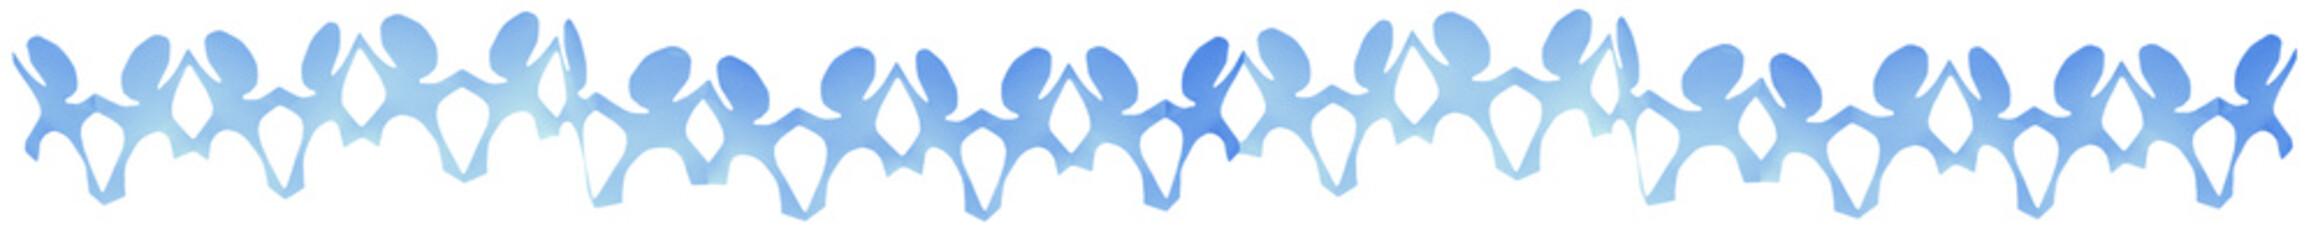 ribambelle bleue, fond blanc